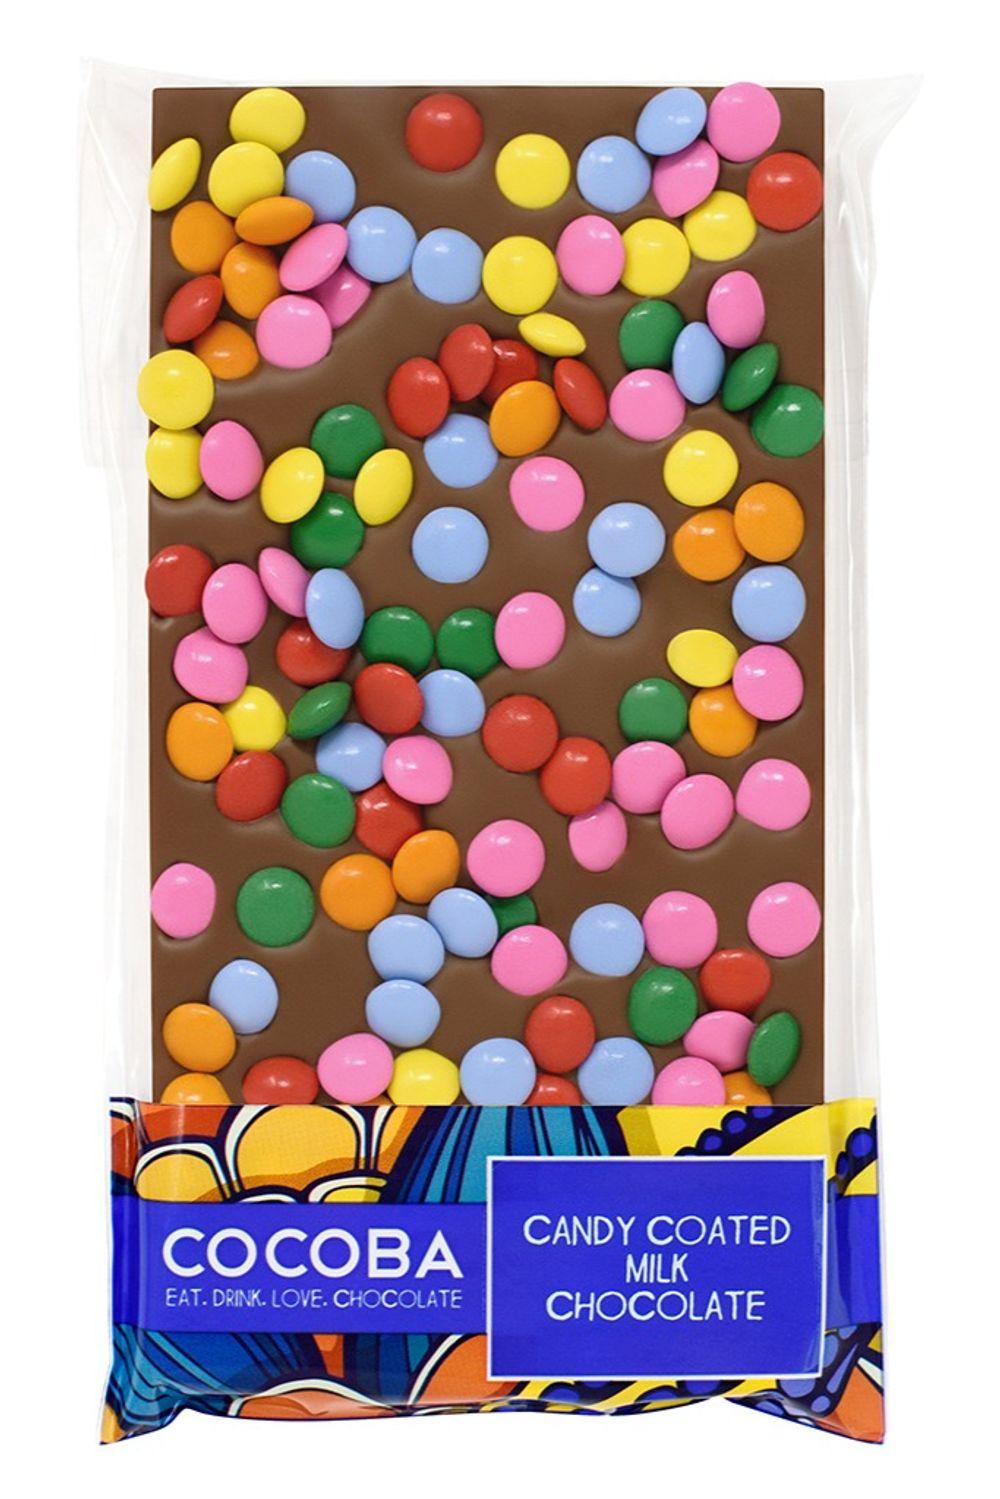 Candy Coated Milk Chocolate Bar